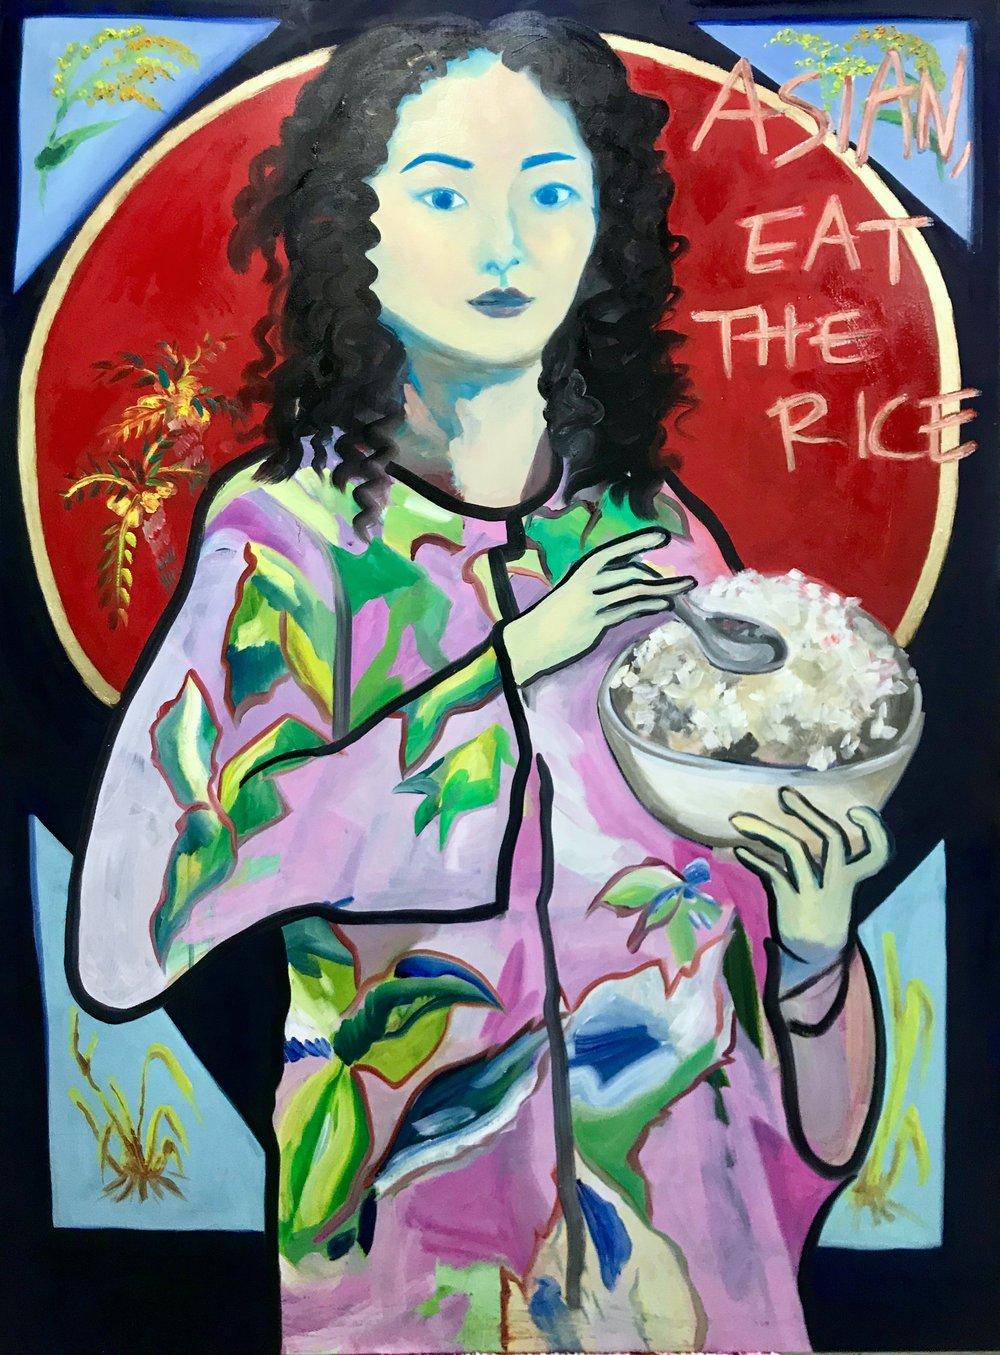 Asian, eat the rice.JPG